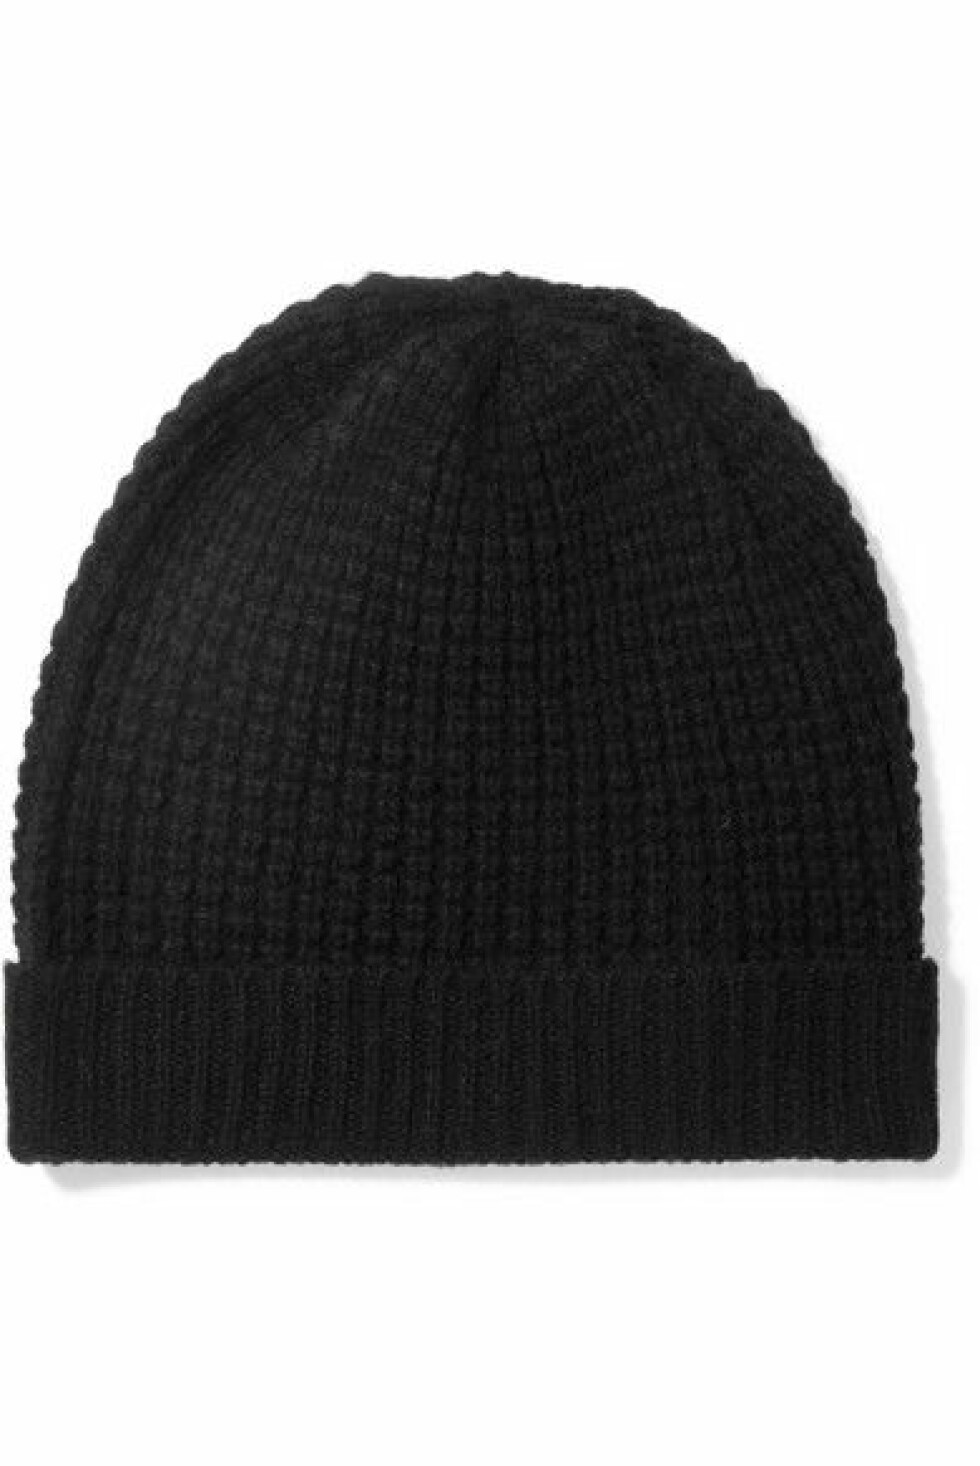 Kasjmirlue fra Madeleine Thompson  1444,-  https://www.net-a-porter.com/no/en/product/885588/madeleine_thompson/holby-waffle-knit-cashmere-beanie